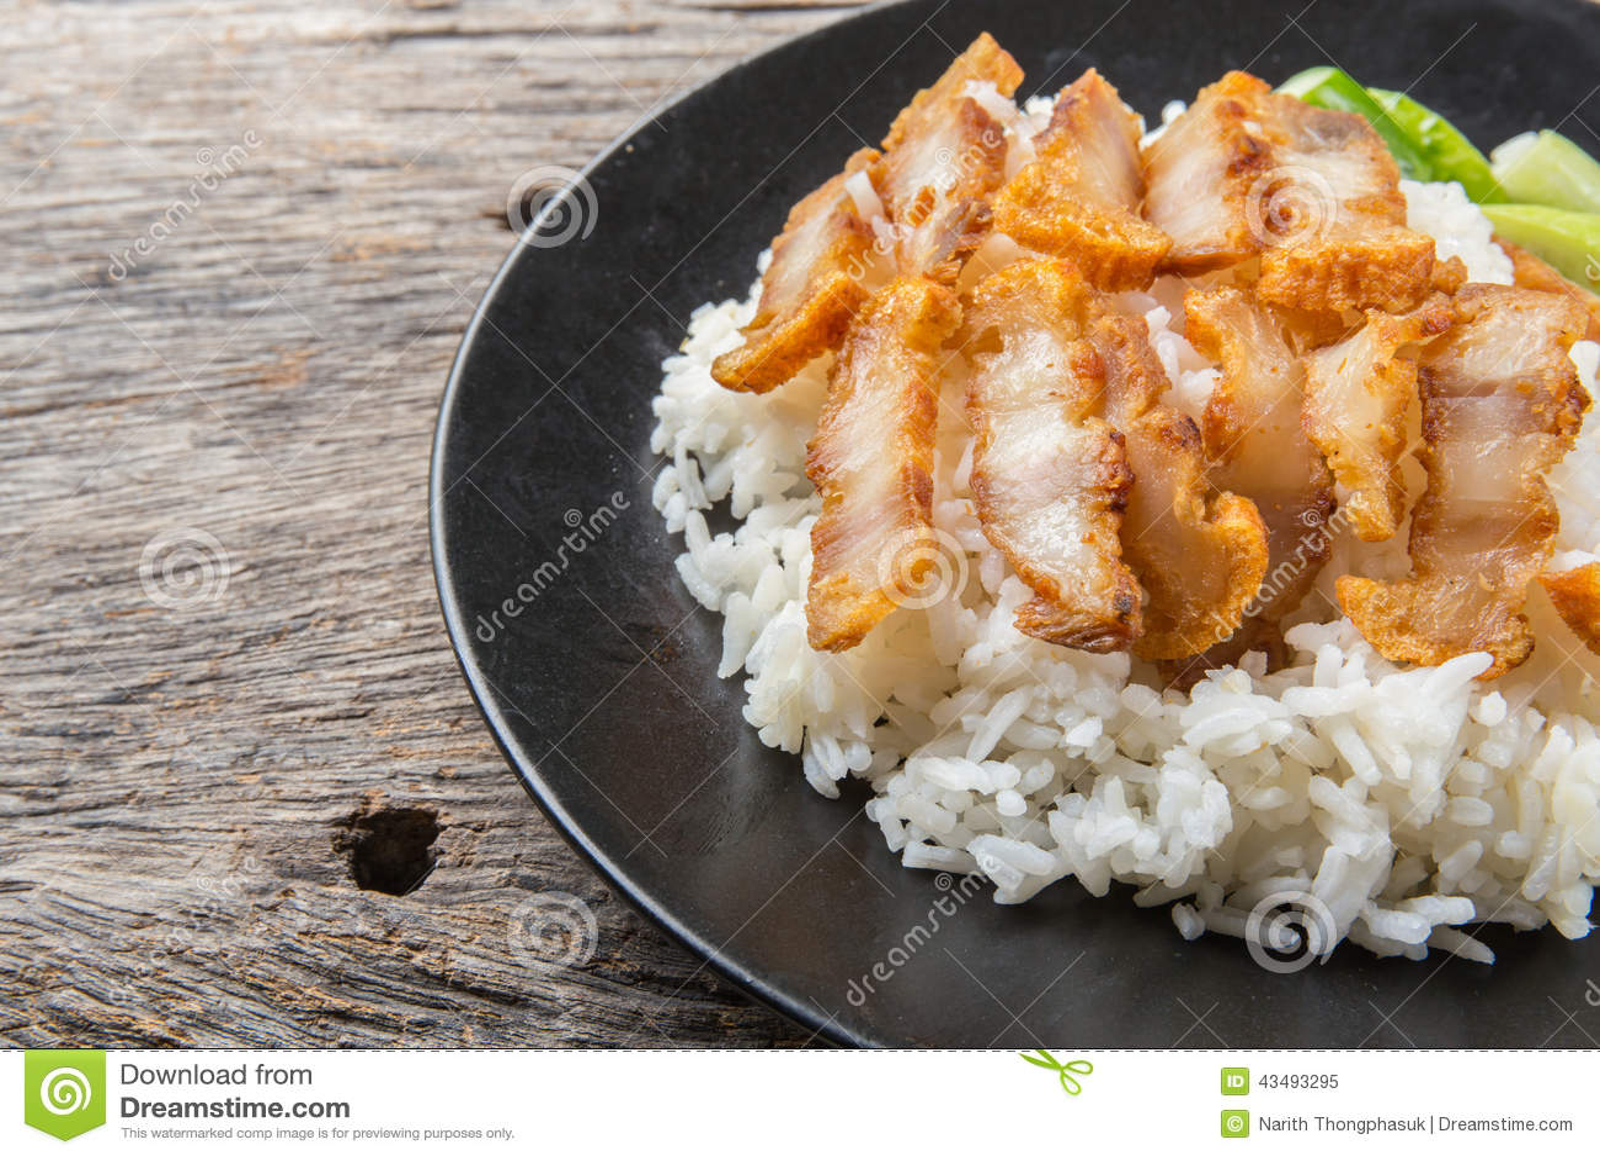 ... inspired rice crisps recipes dishmaps vietnamese inspired rice crisps